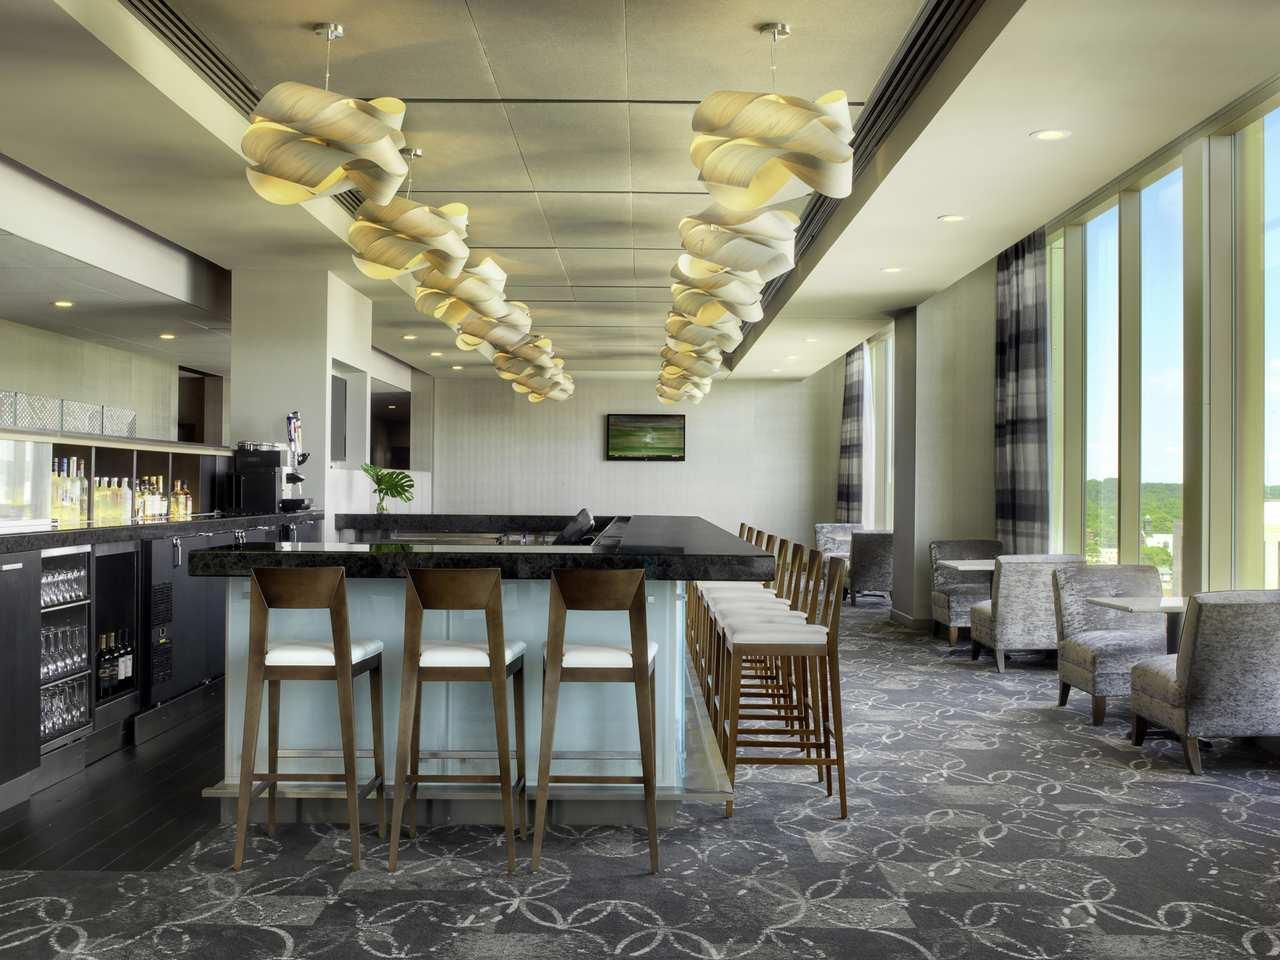 DoubleTree by Hilton Hotel Cedar Rapids Convention Complex image 25